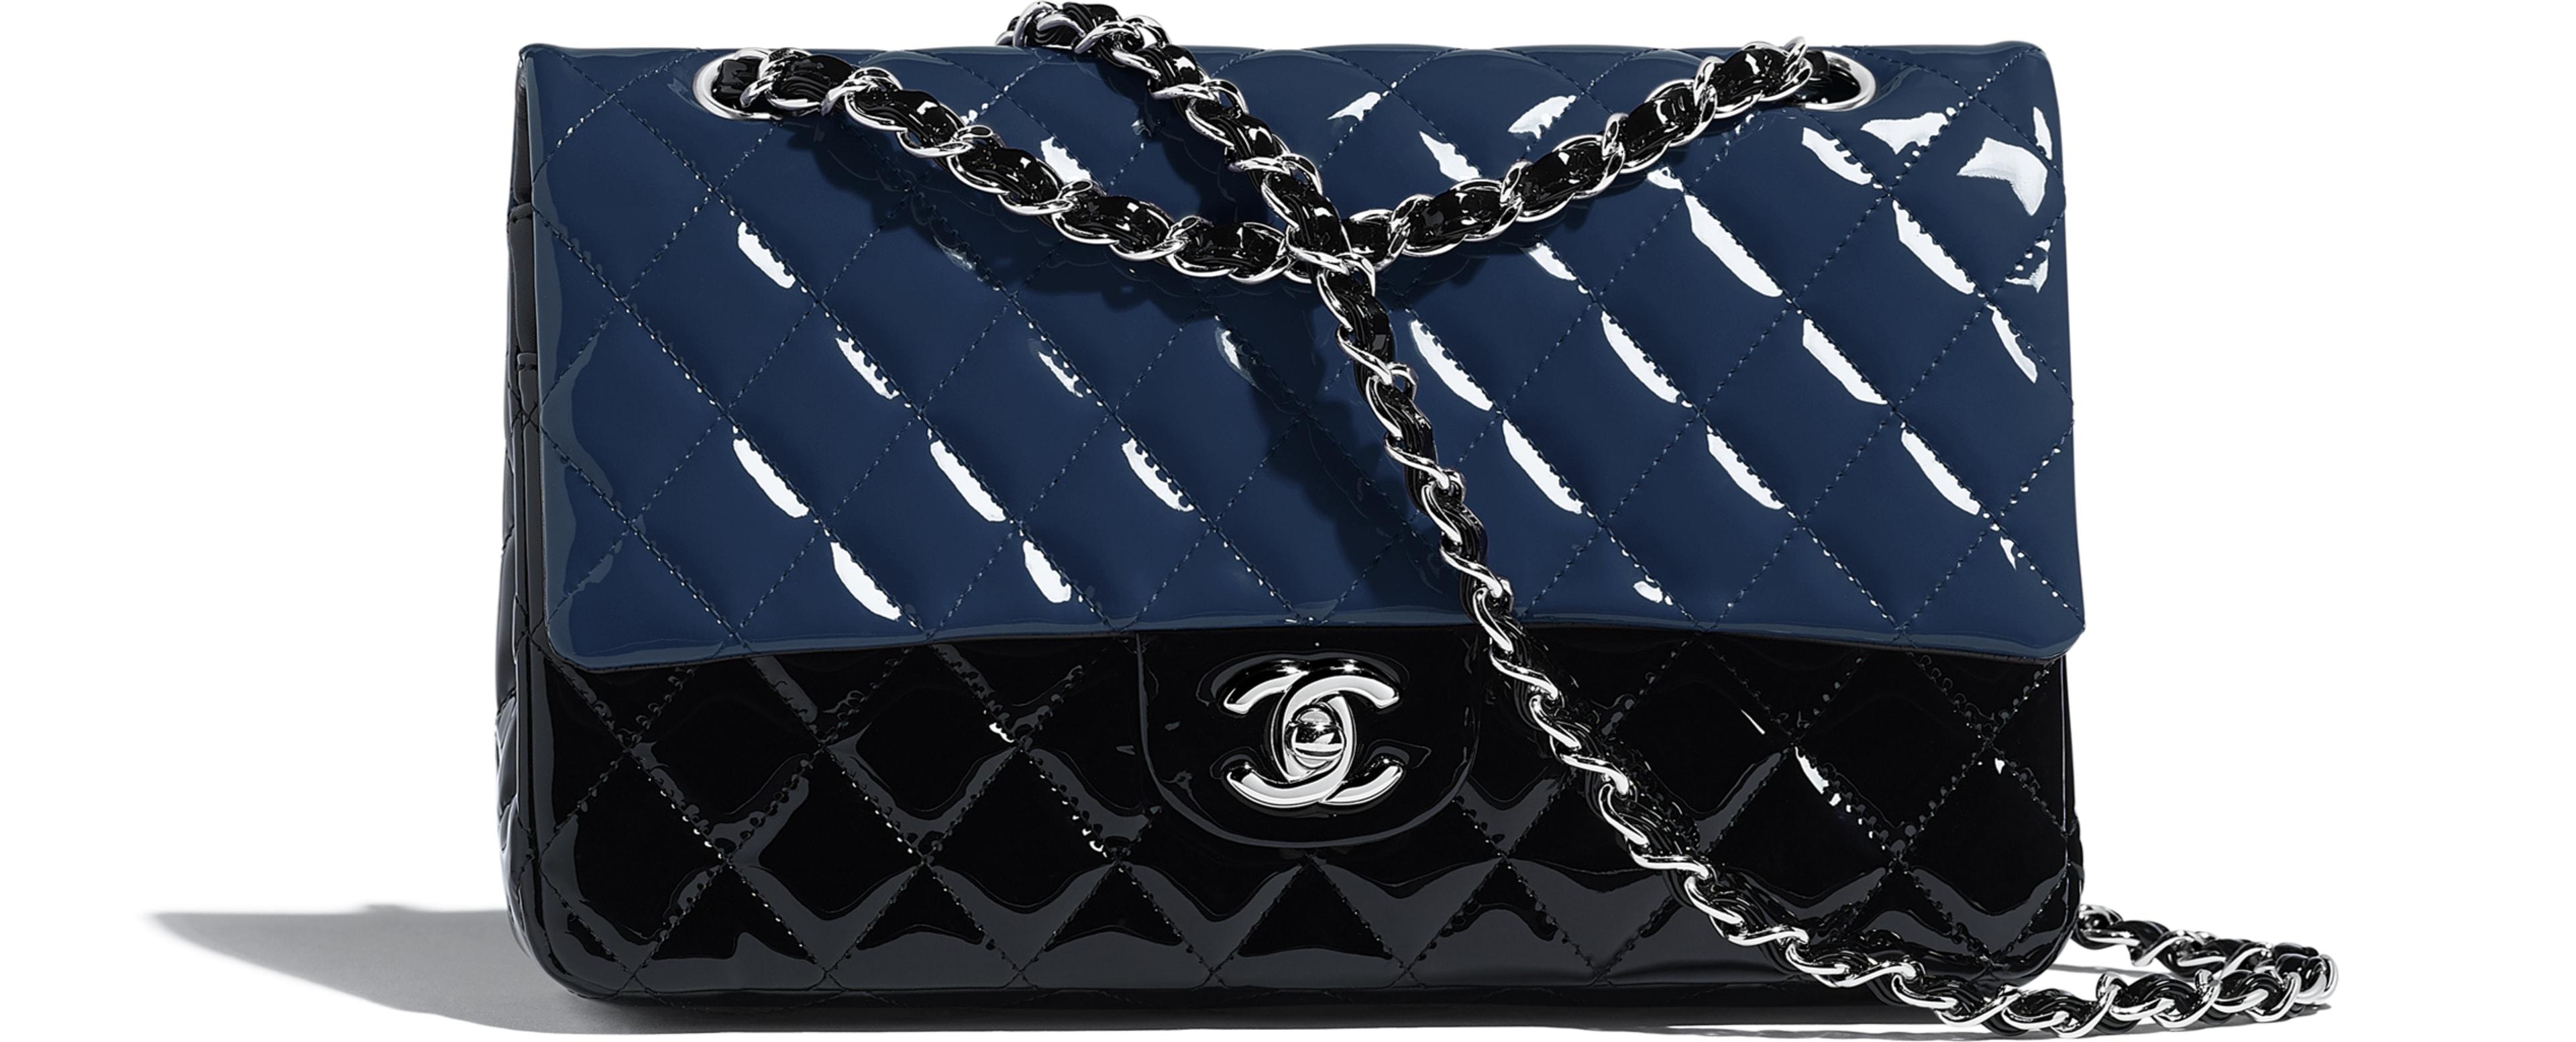 Patent Calfskin & Silver-Tone Metal Navy Blue & Black